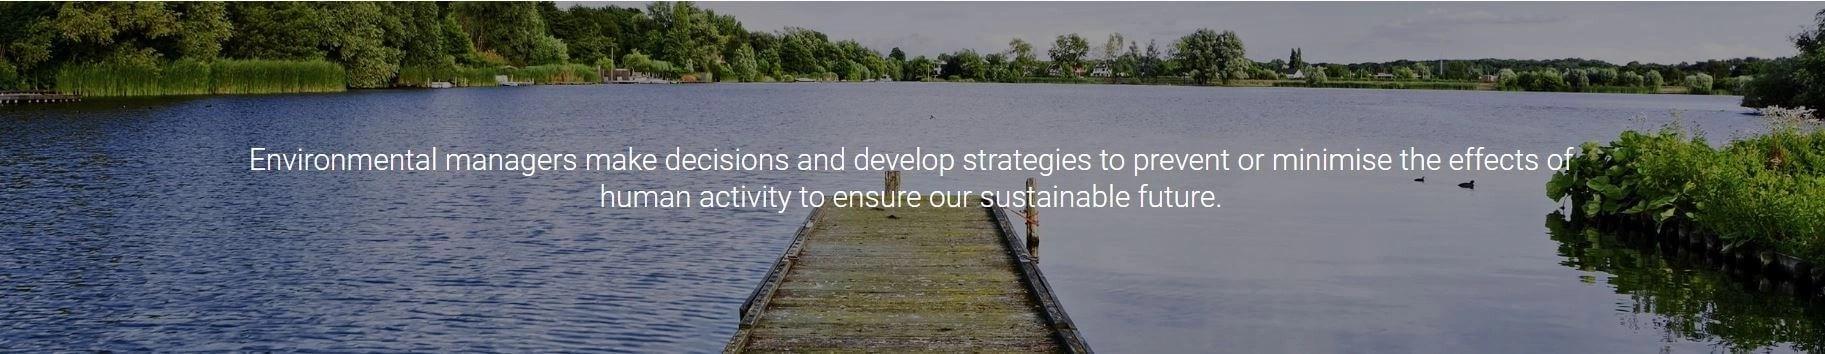 昆士蘭大學(UQ) – 環境管理碩士(Environmental Management)